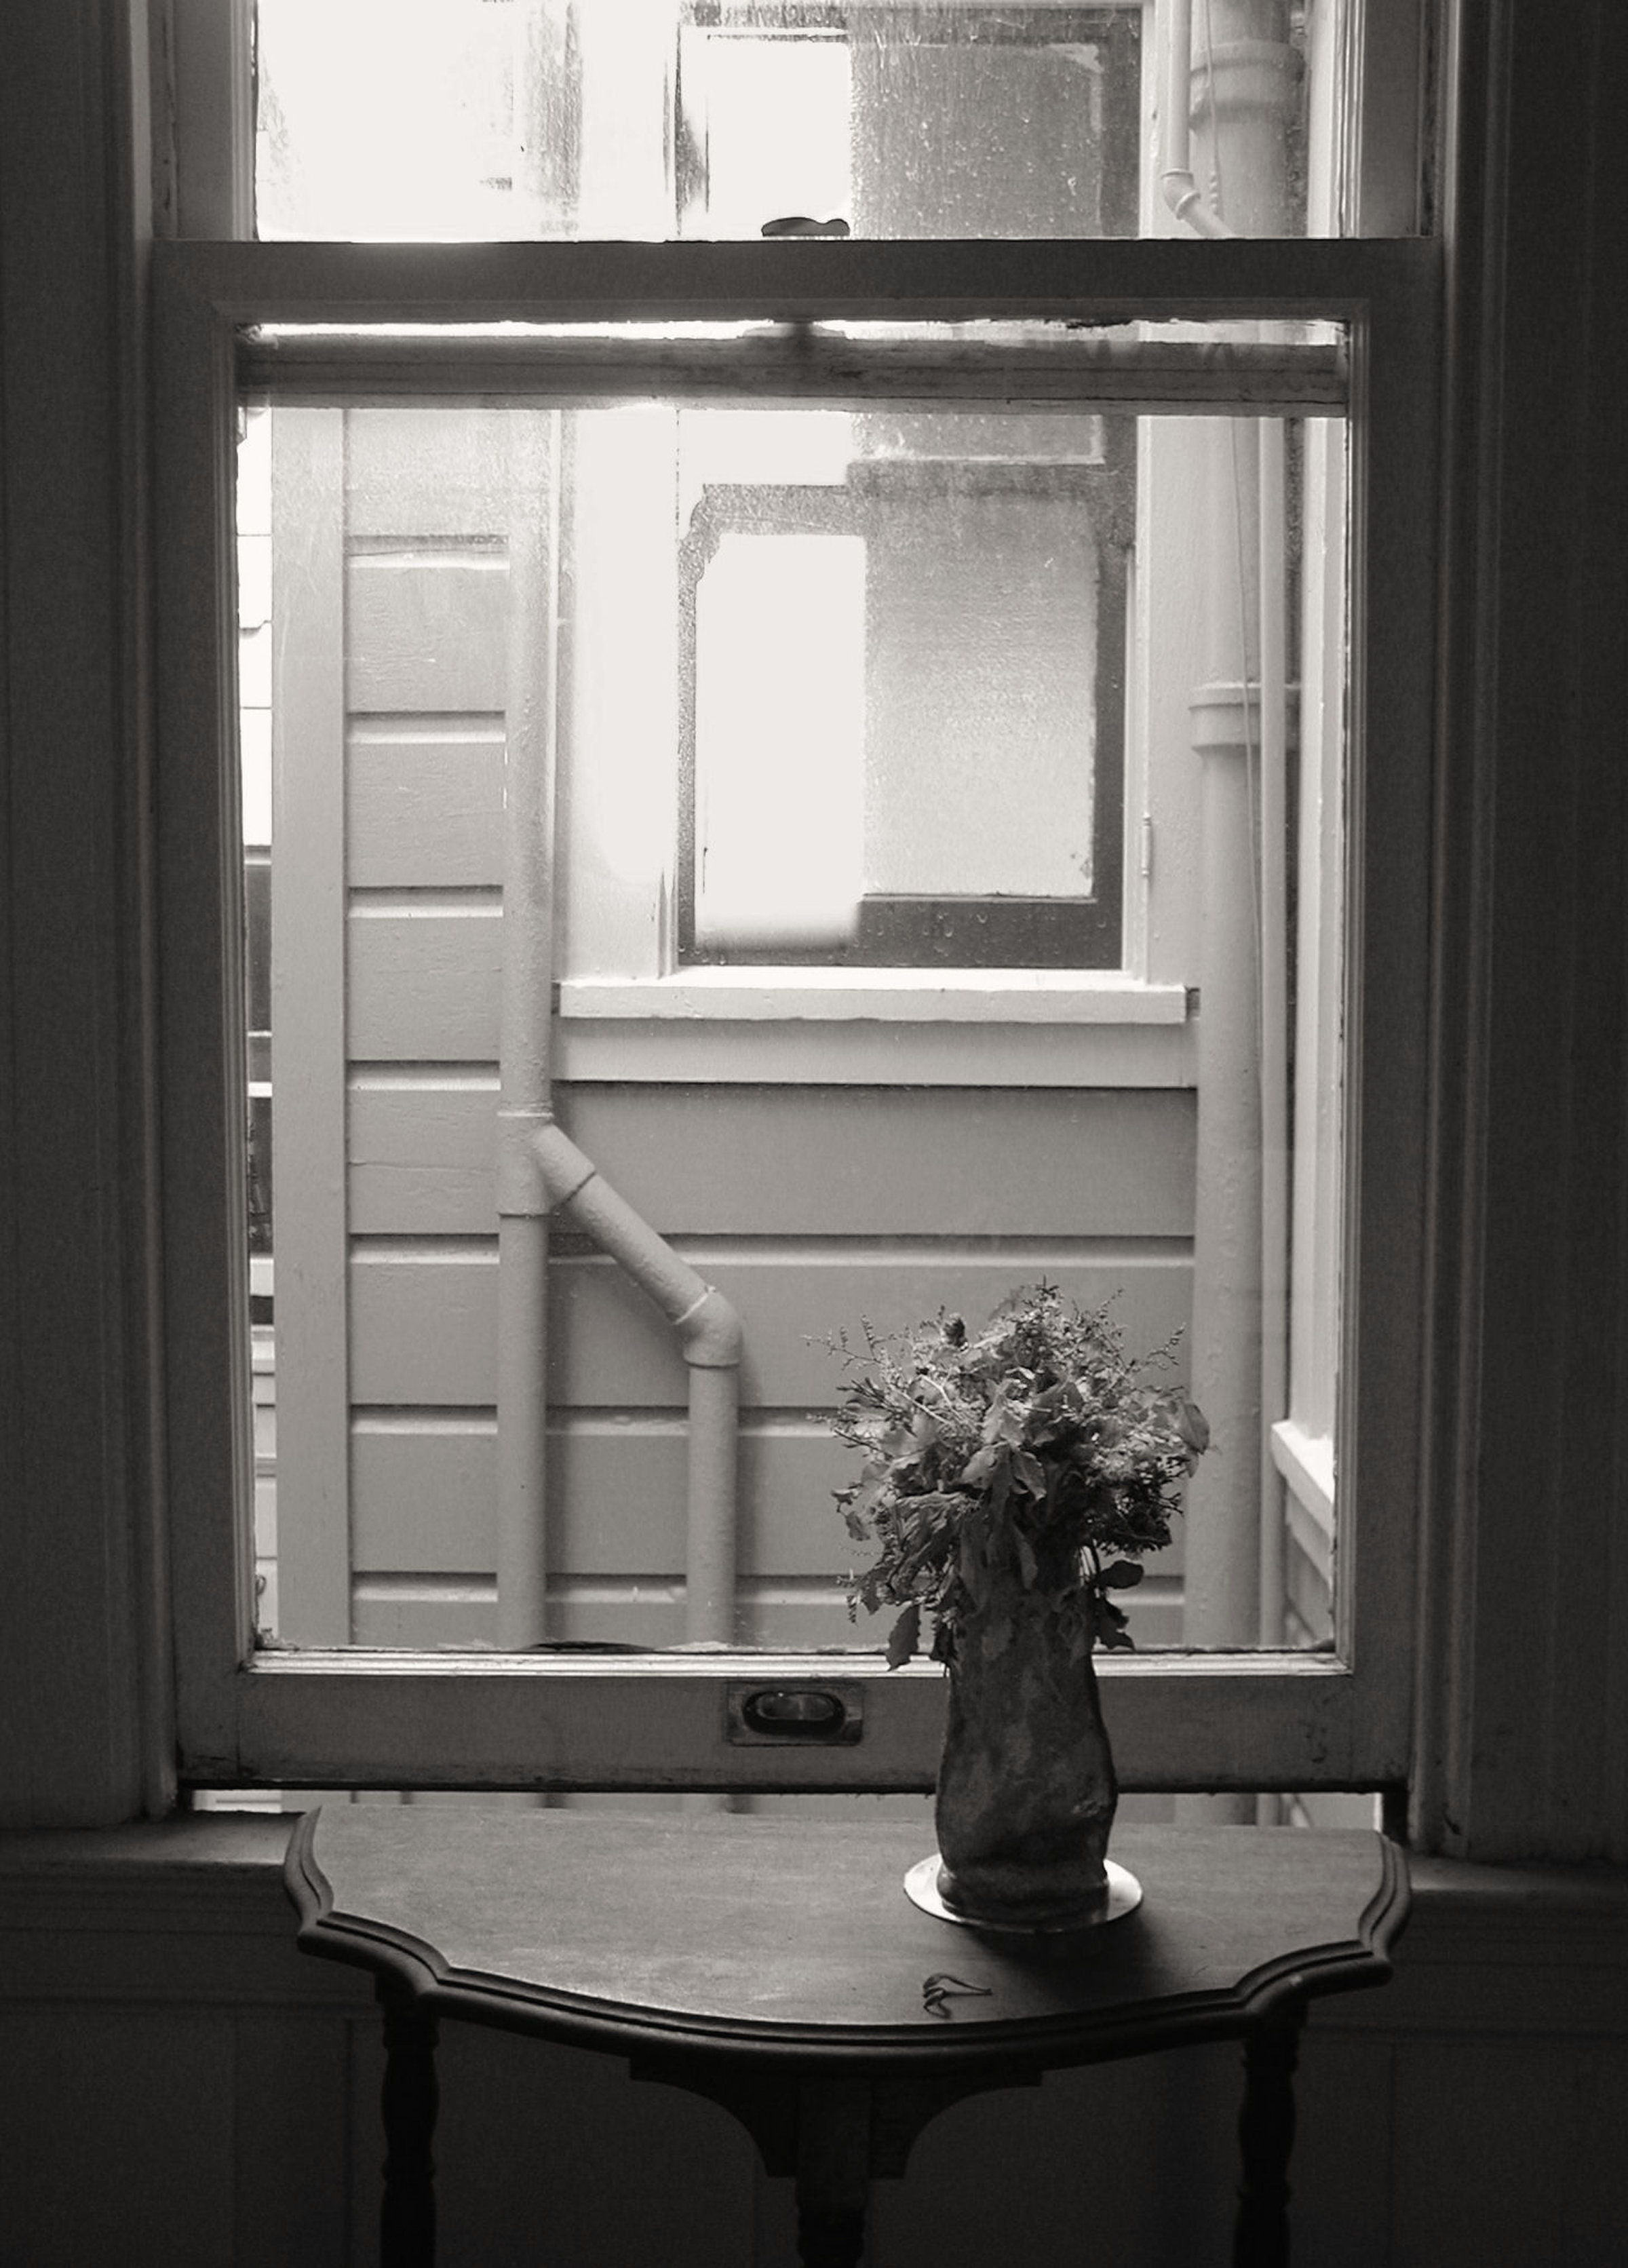 San Francisco window